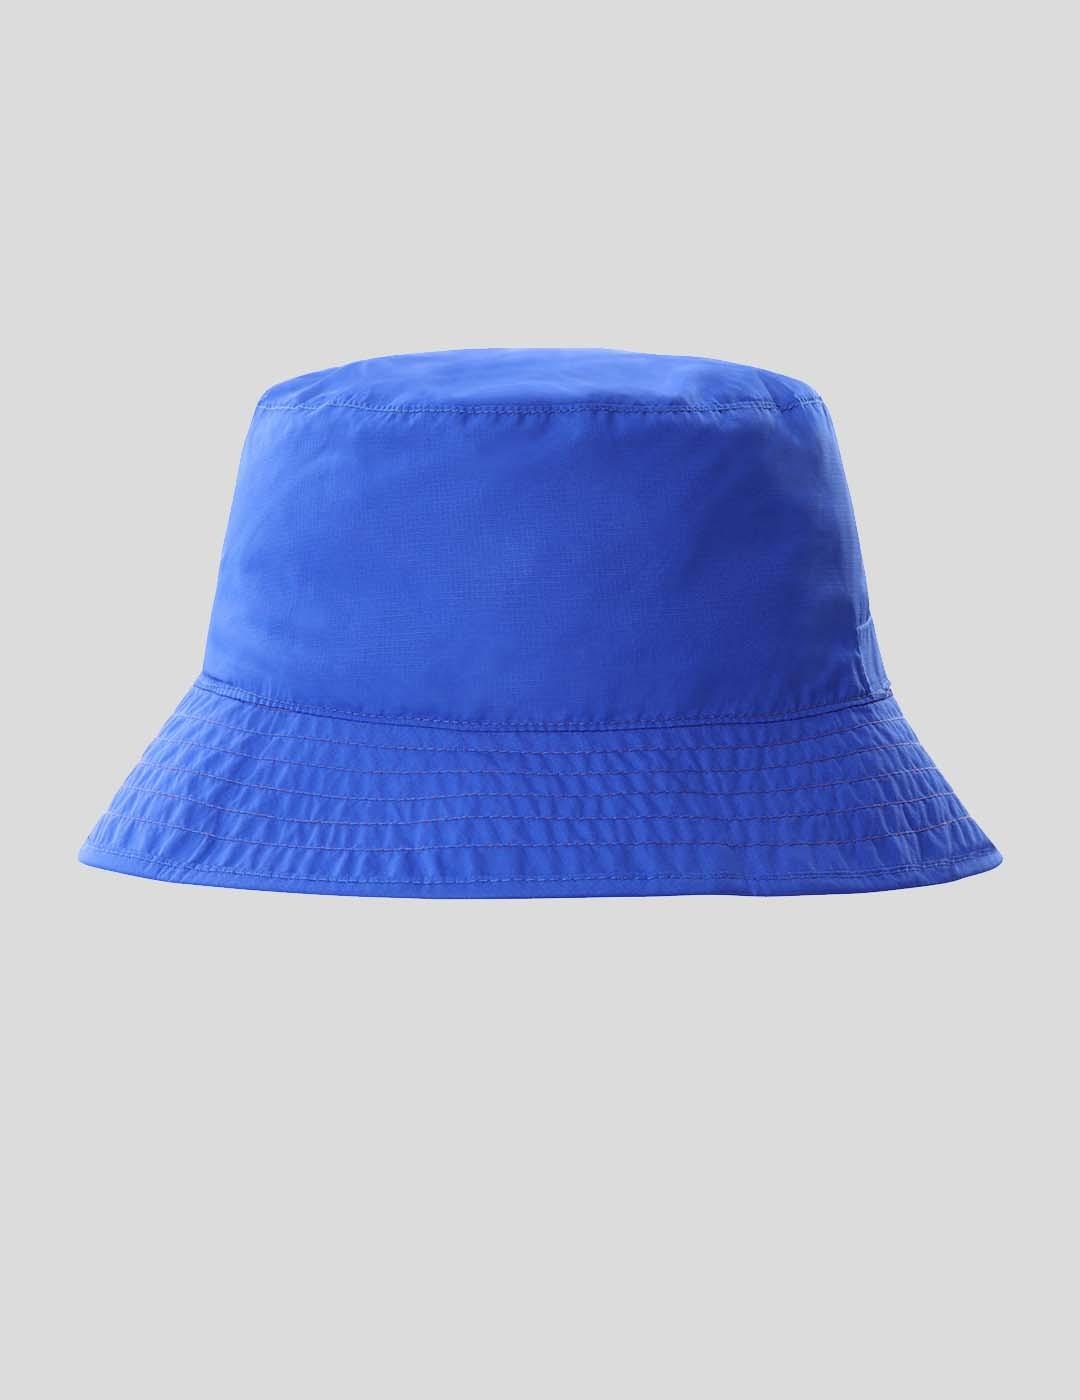 GORRO THE NORTH FACE SUN STASH BUCKET HAT HORIZNRD / TFN BLUE